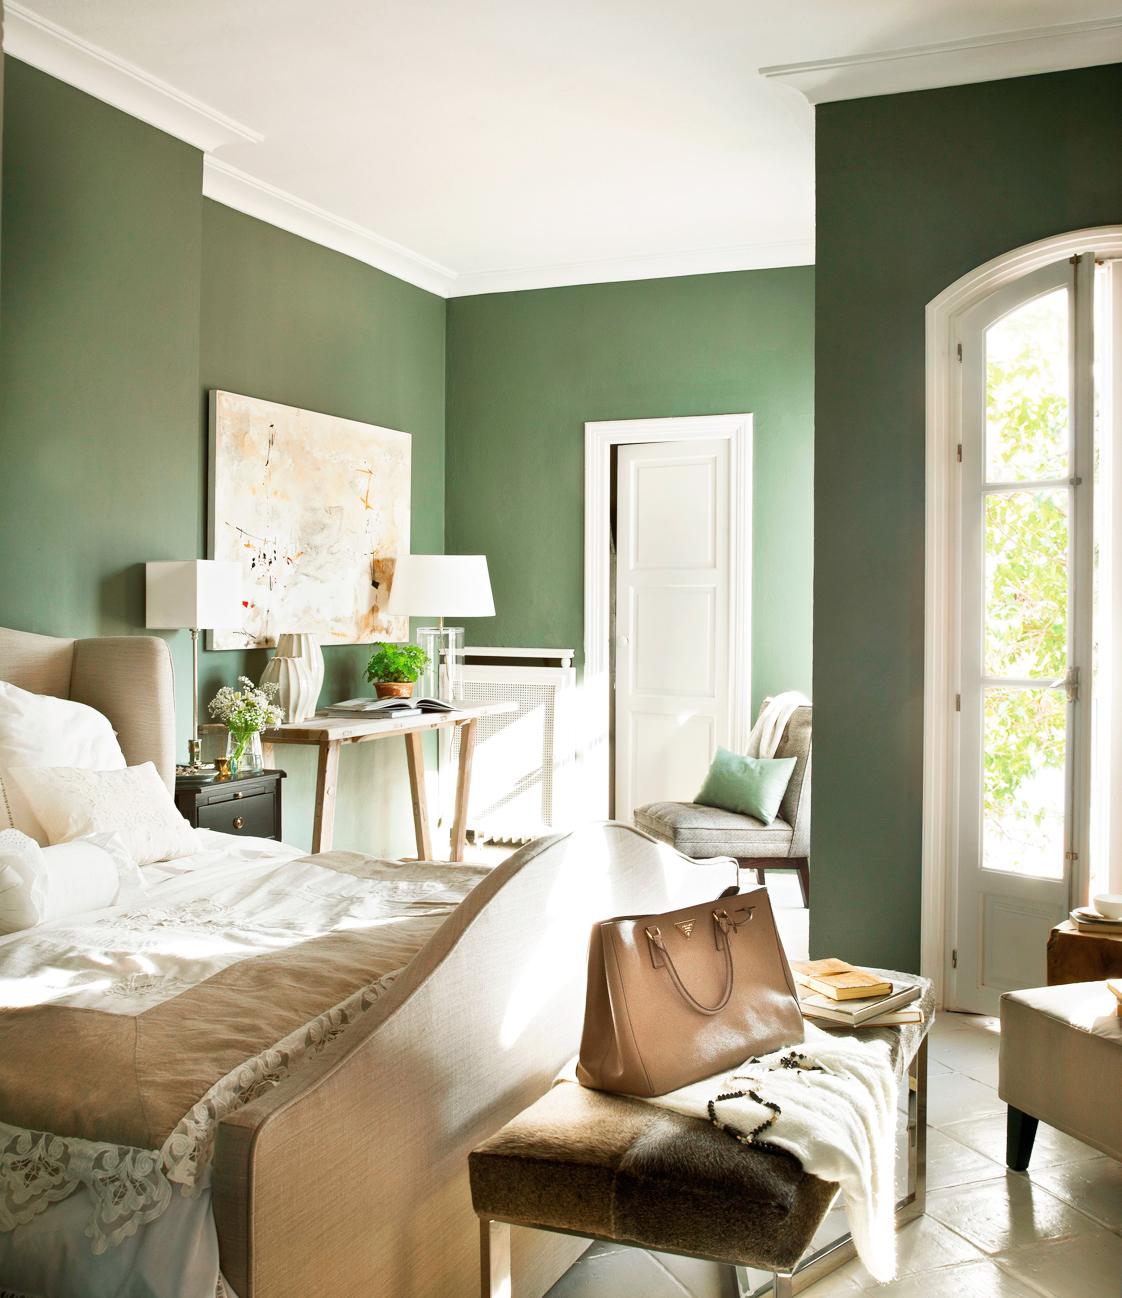 C mo elegir el color para tu casa for Muebles oscuros paredes claras